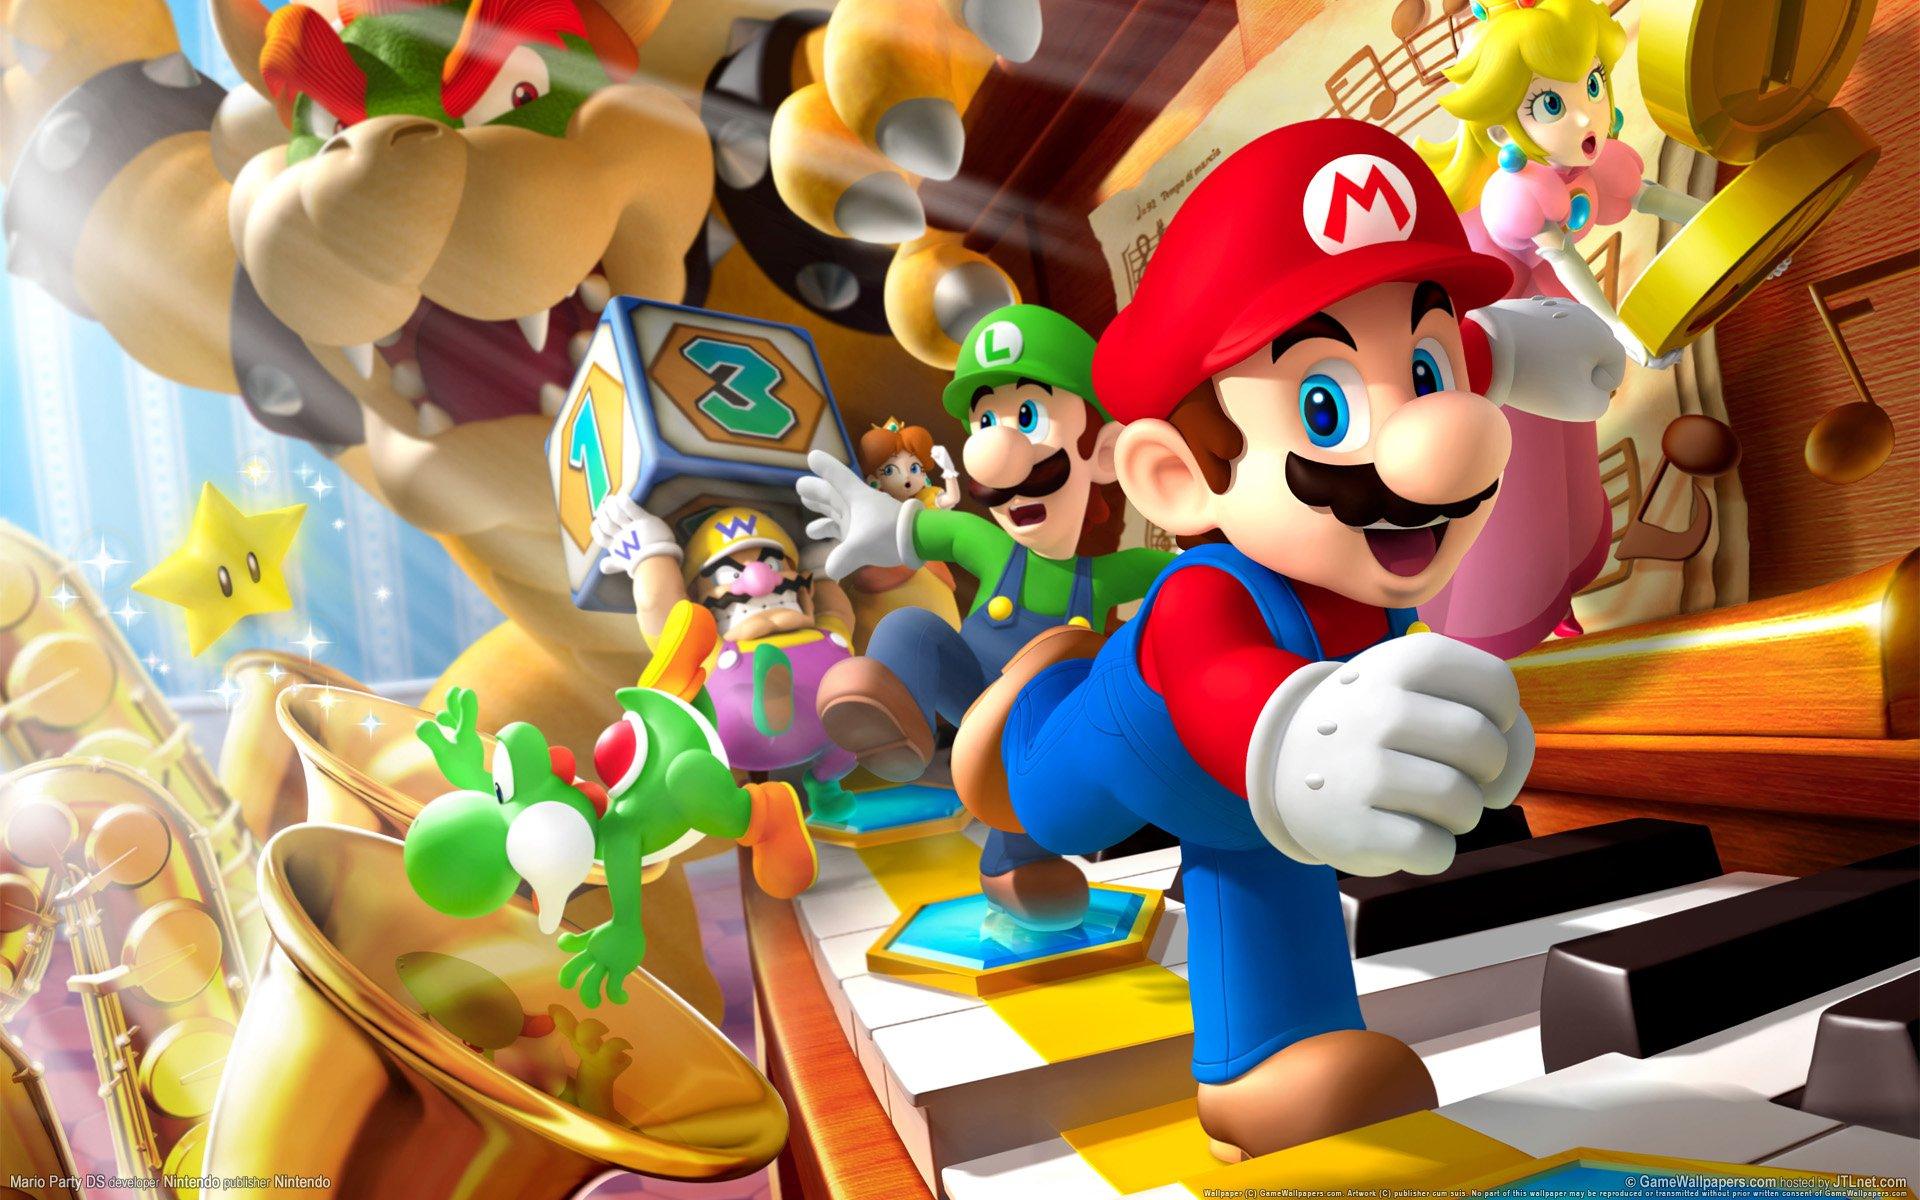 Video Game - Mario Party DS  Mario Wallpaper